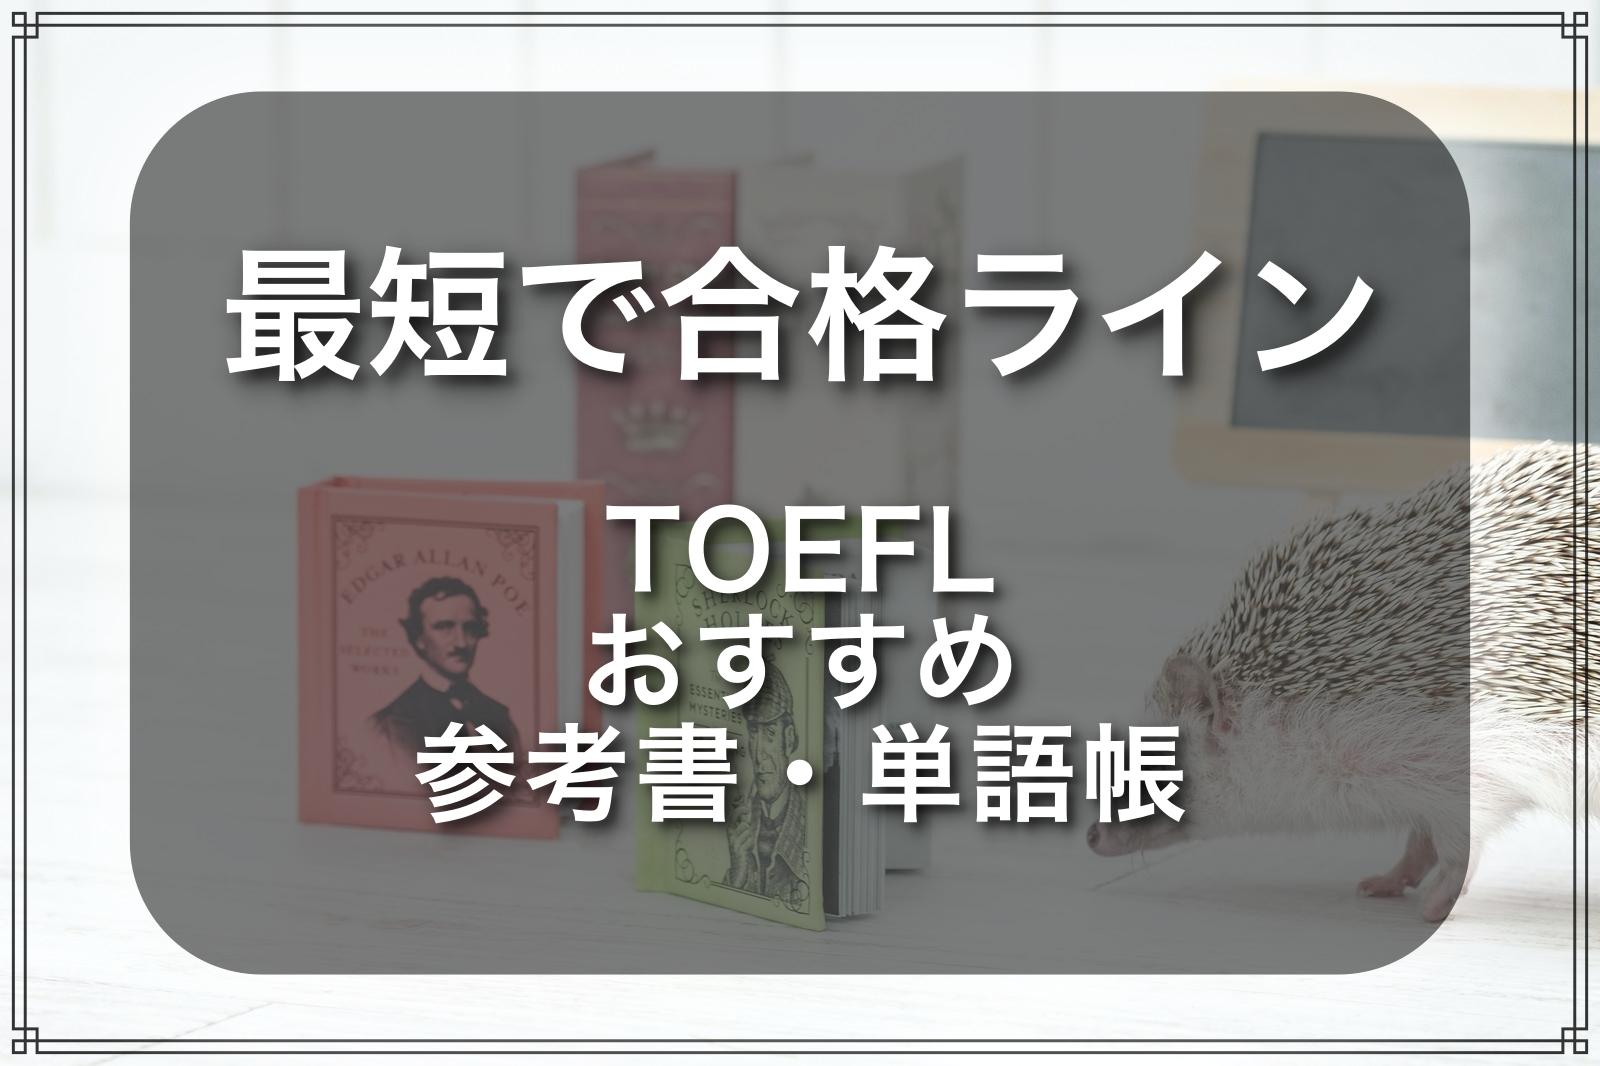 TOEFL参考書